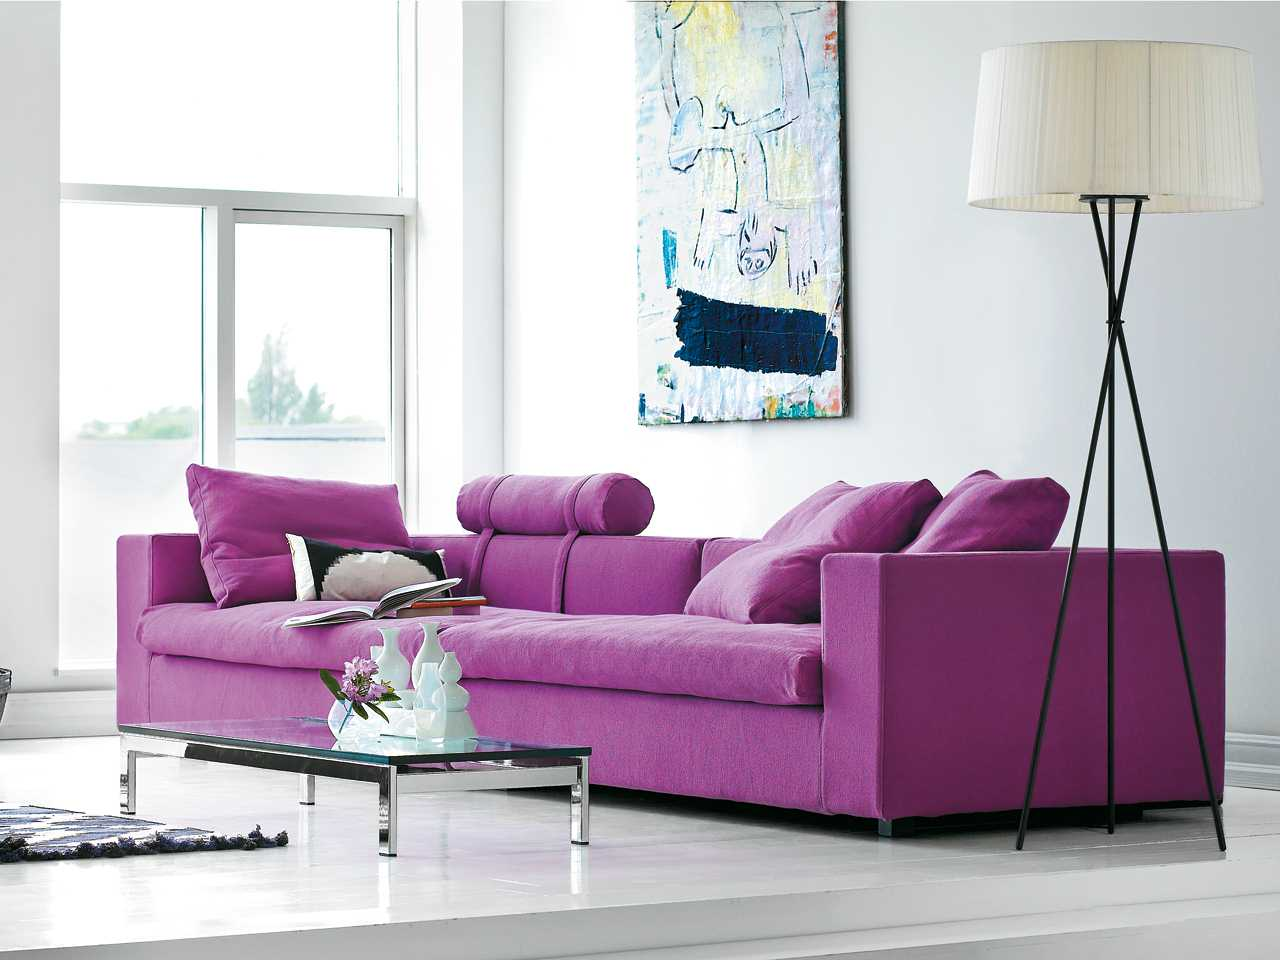 Canapea mov cu lampadar metalic negru cu abajur alb si masa din sticla cu suport metalic